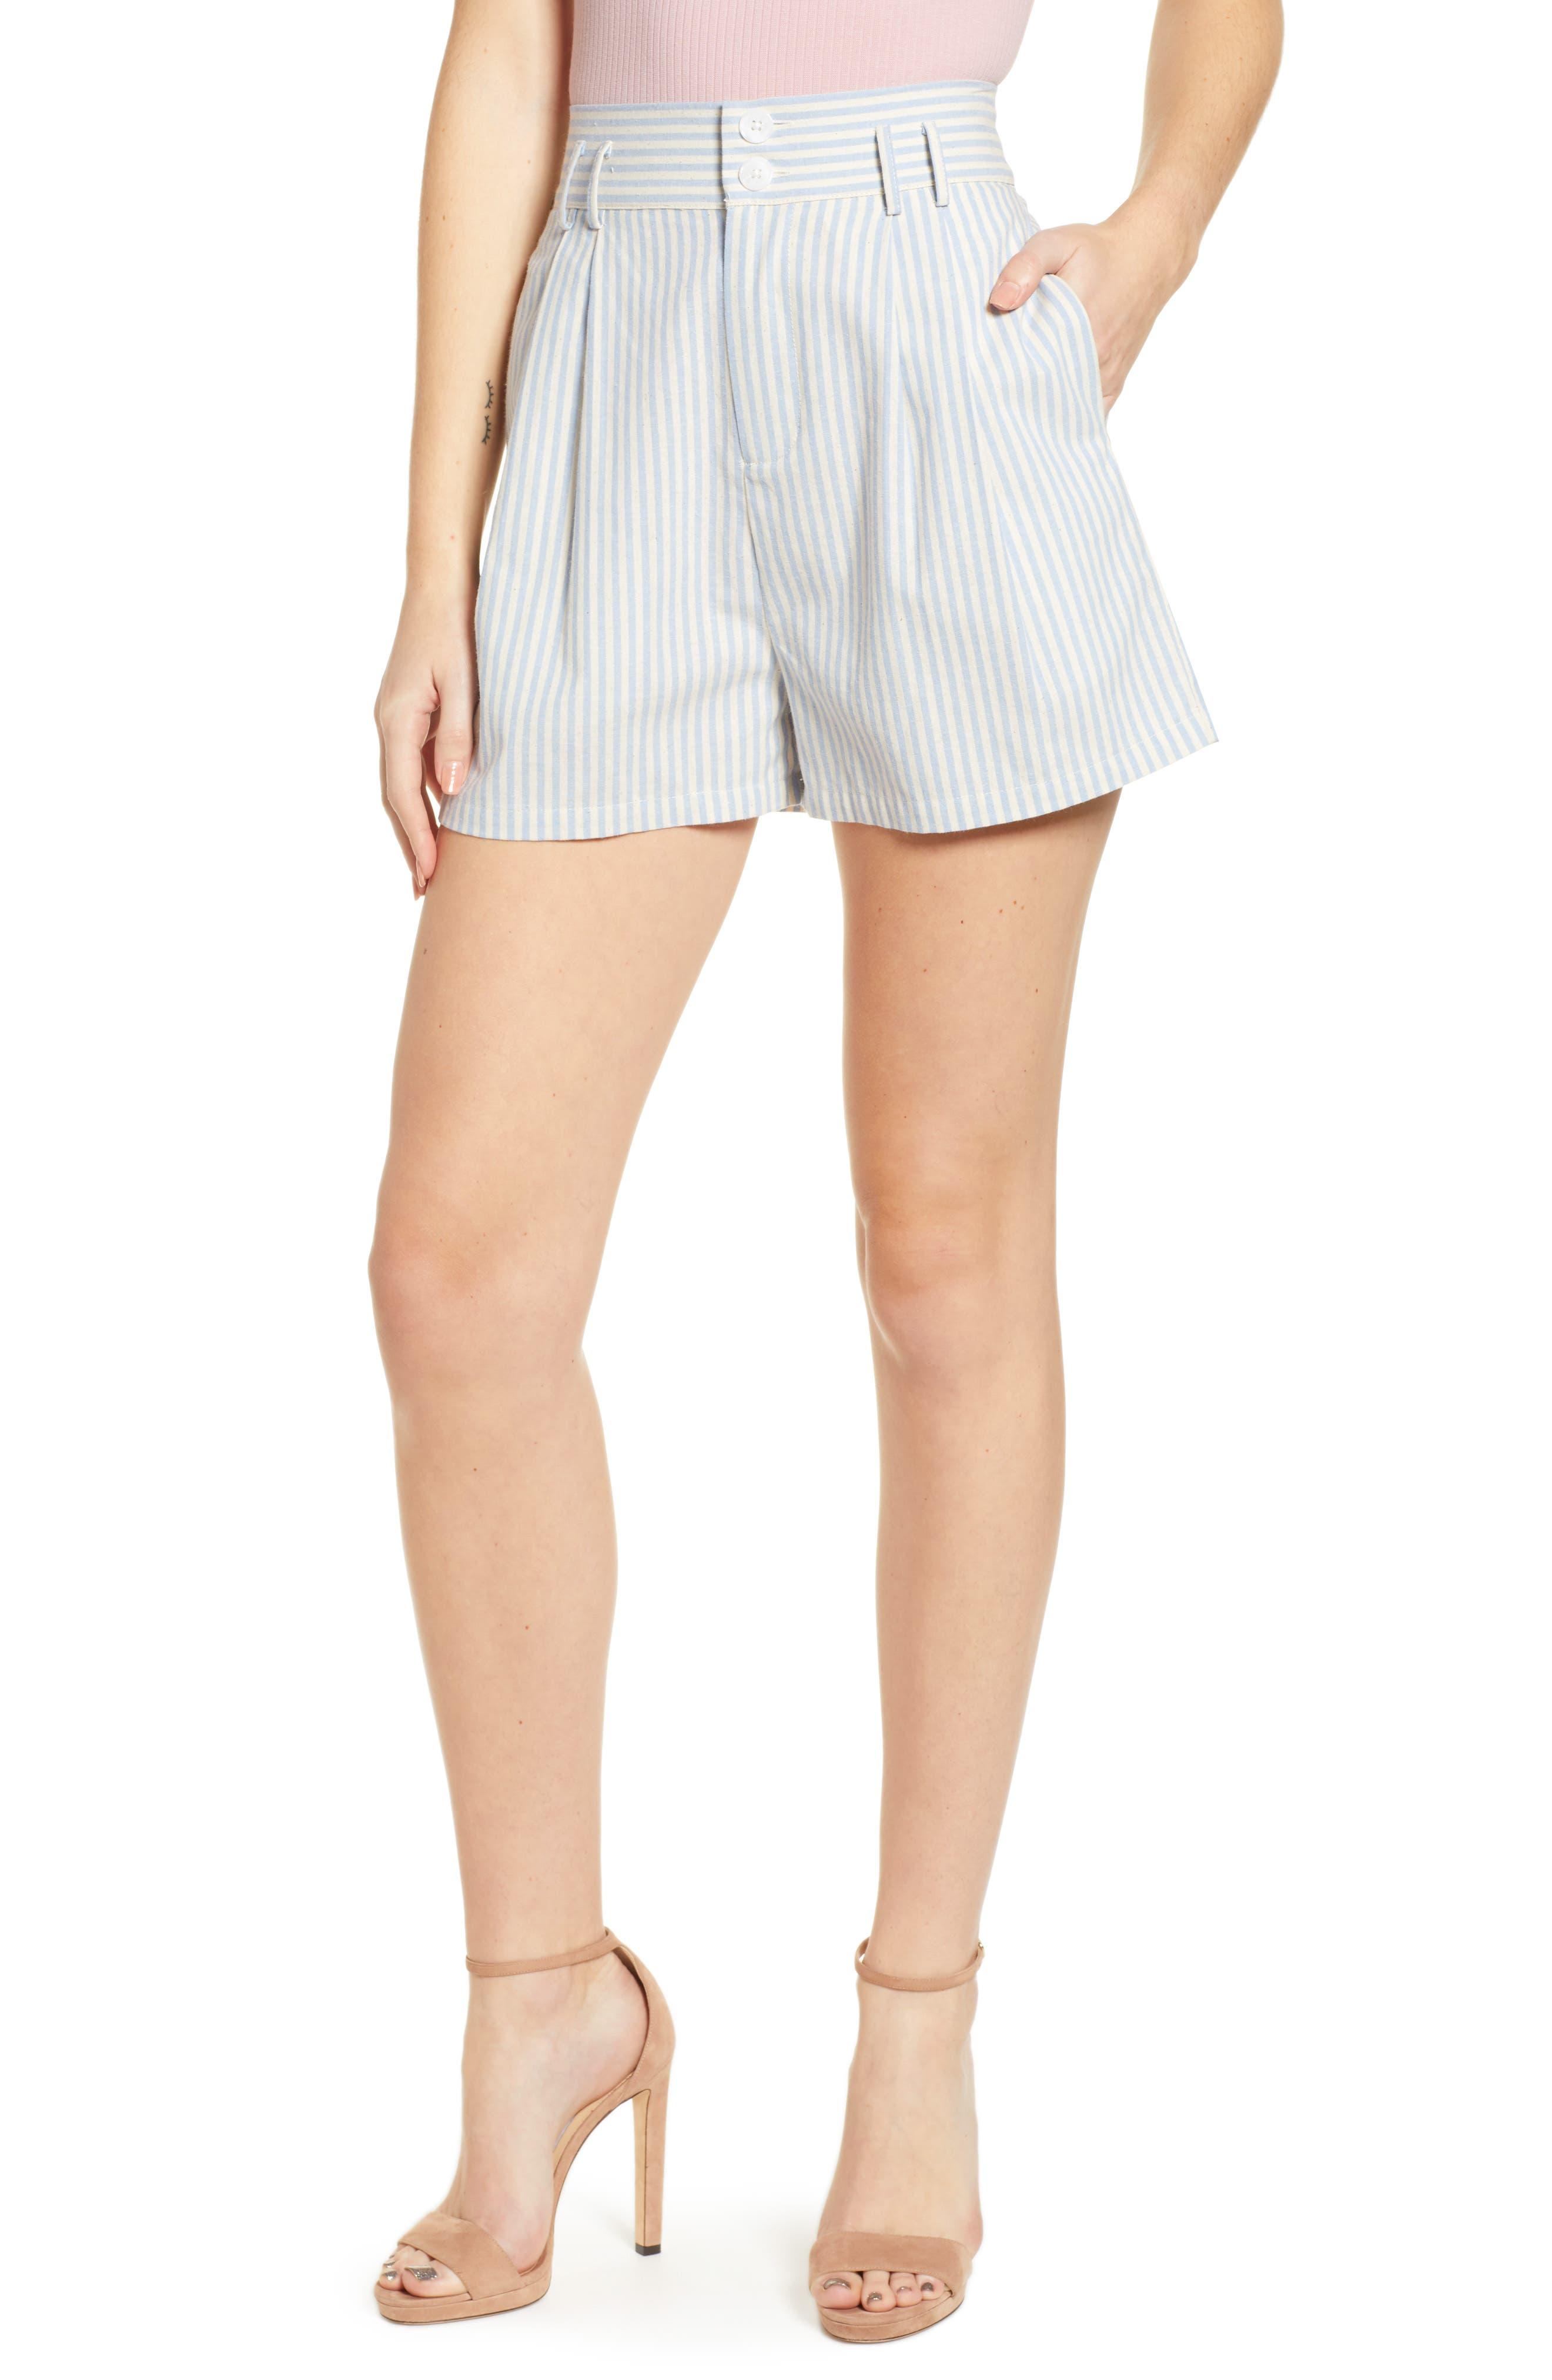 Vintage Shorts, Culottes,  Capris History Womens English Factory Striped Bermuda Shorts $58.00 AT vintagedancer.com